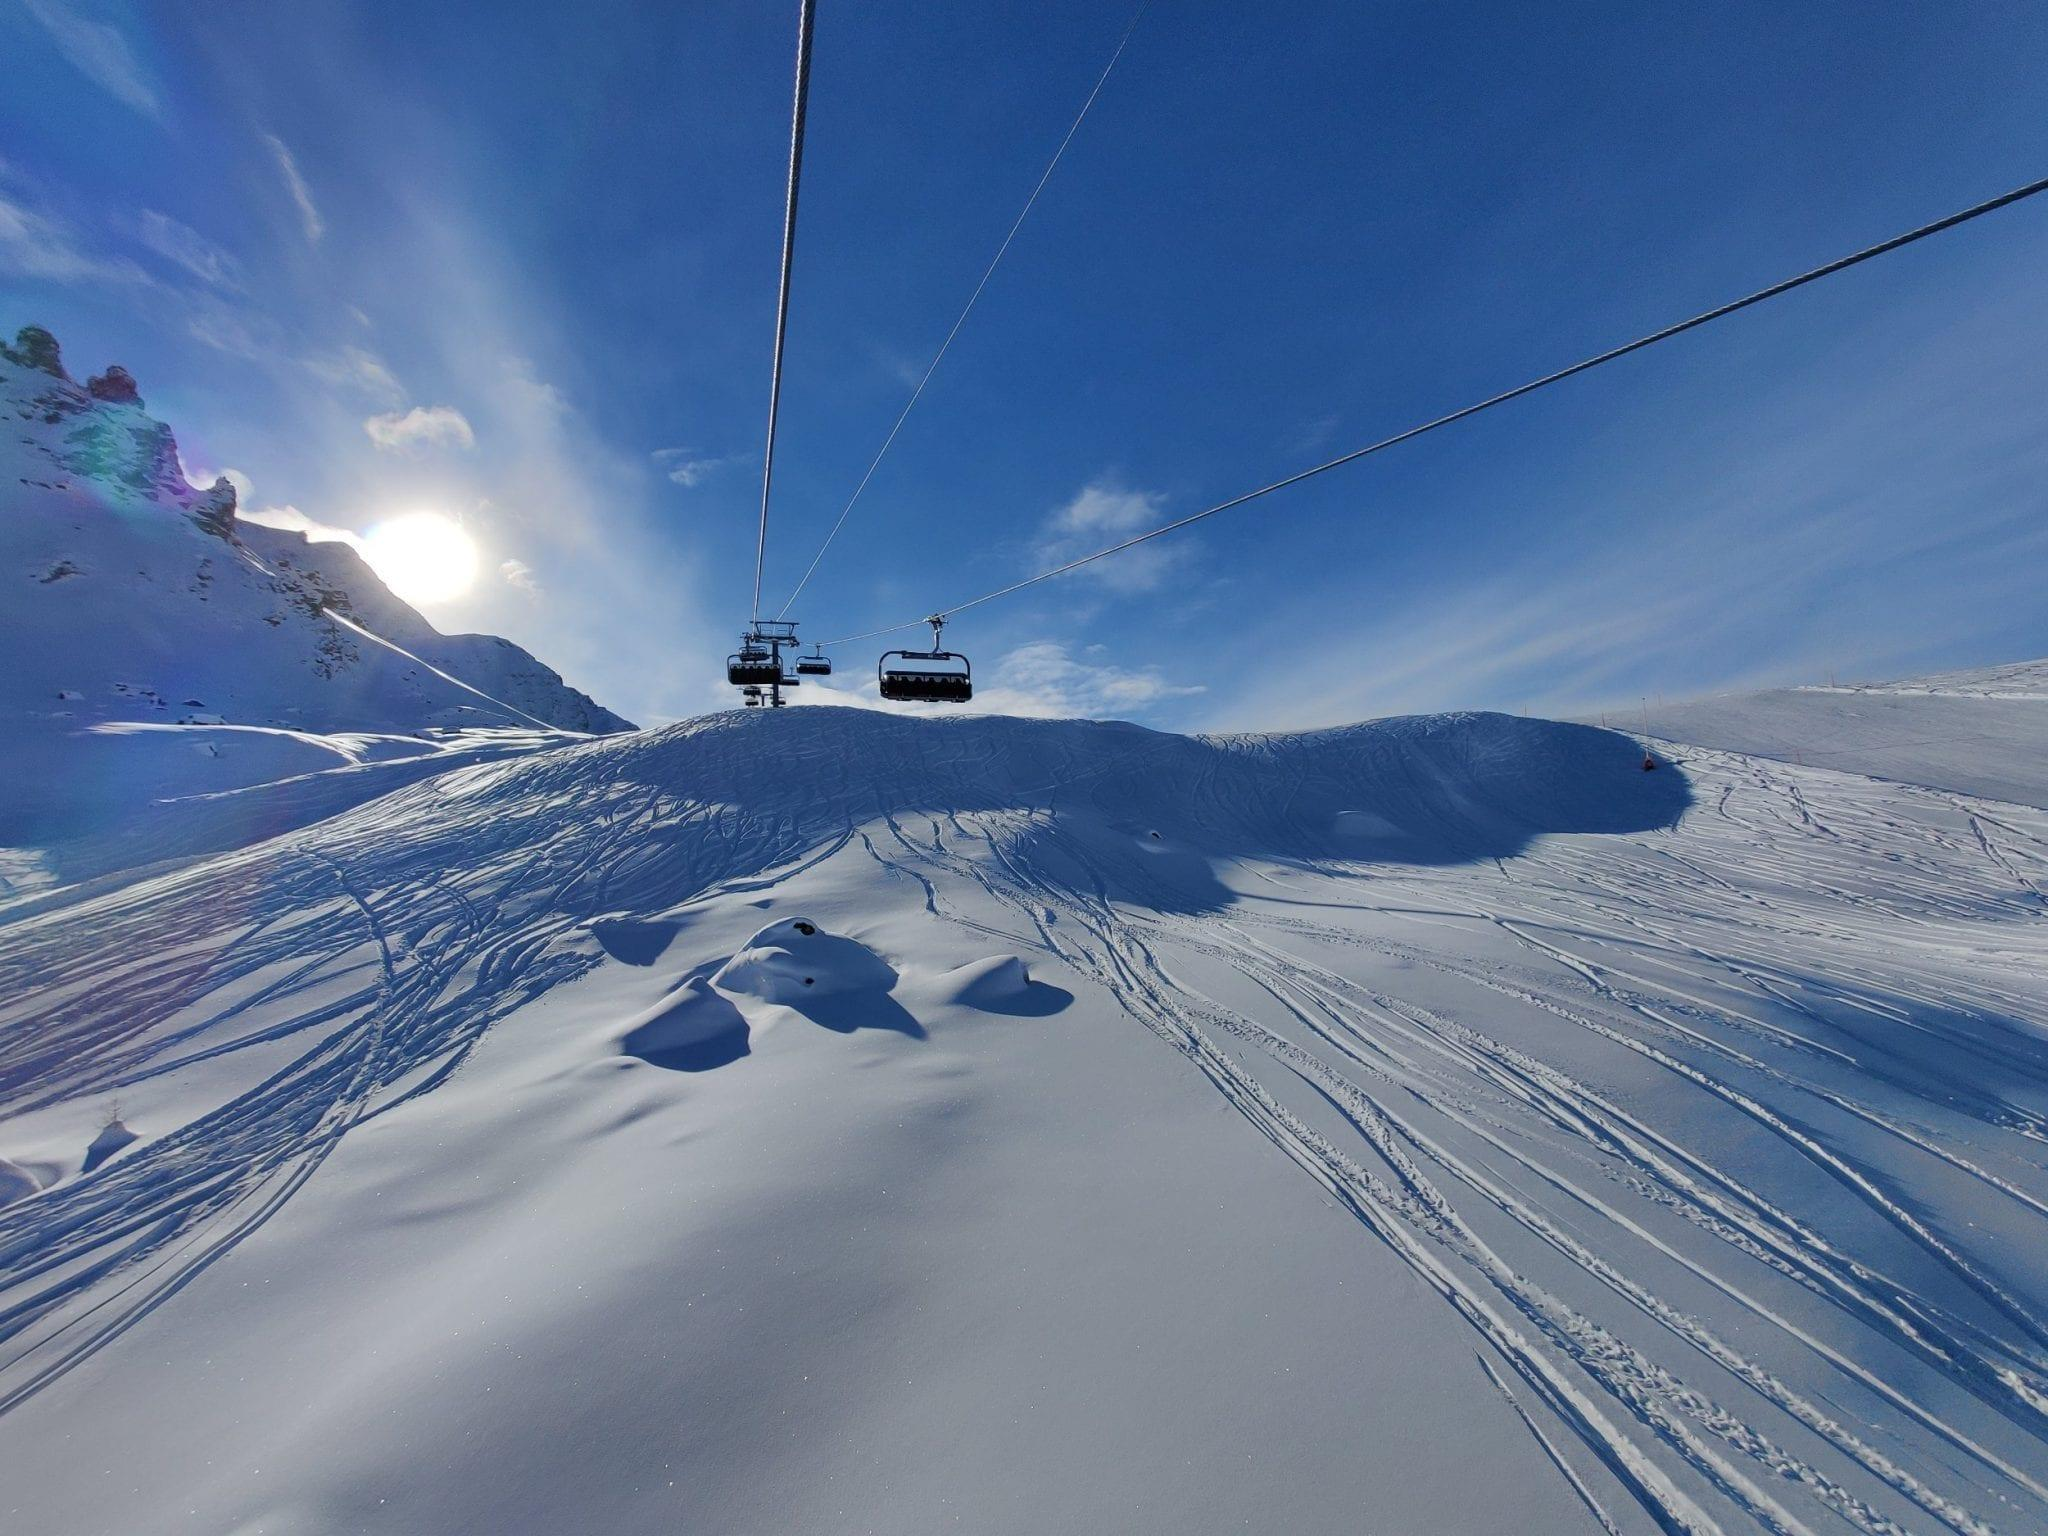 Snowboarding im Engadin